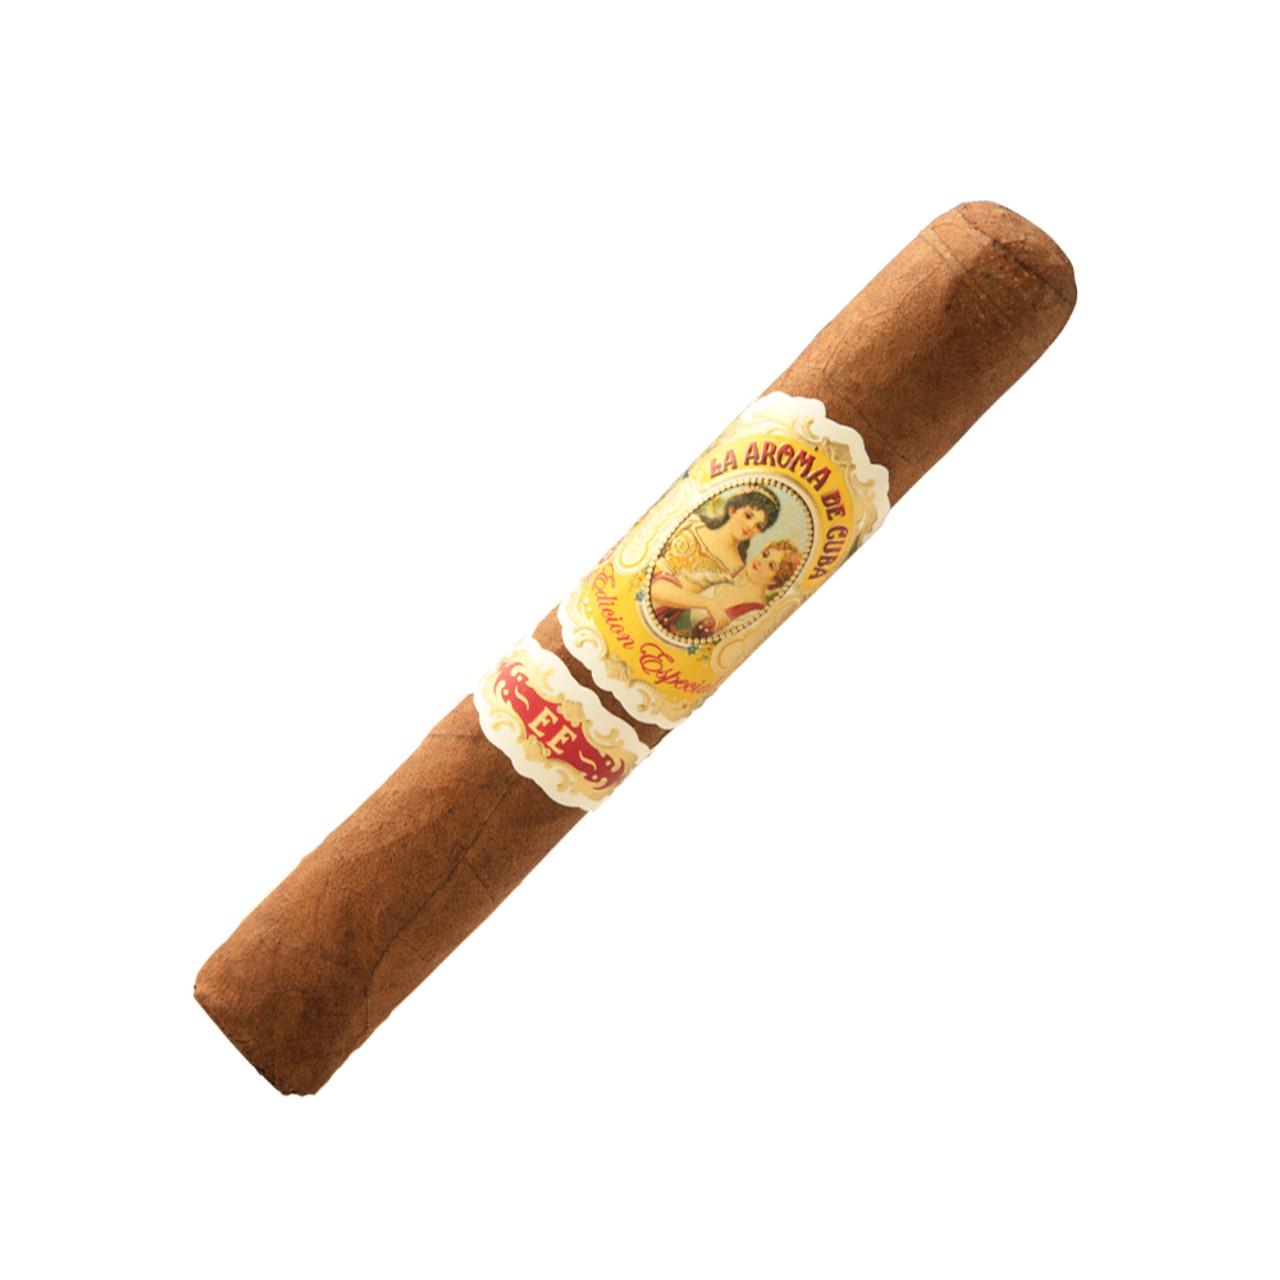 La Aroma de Cuba Edicion Especial Minutos Cigars - 4.5 x 42 (Box of 25)